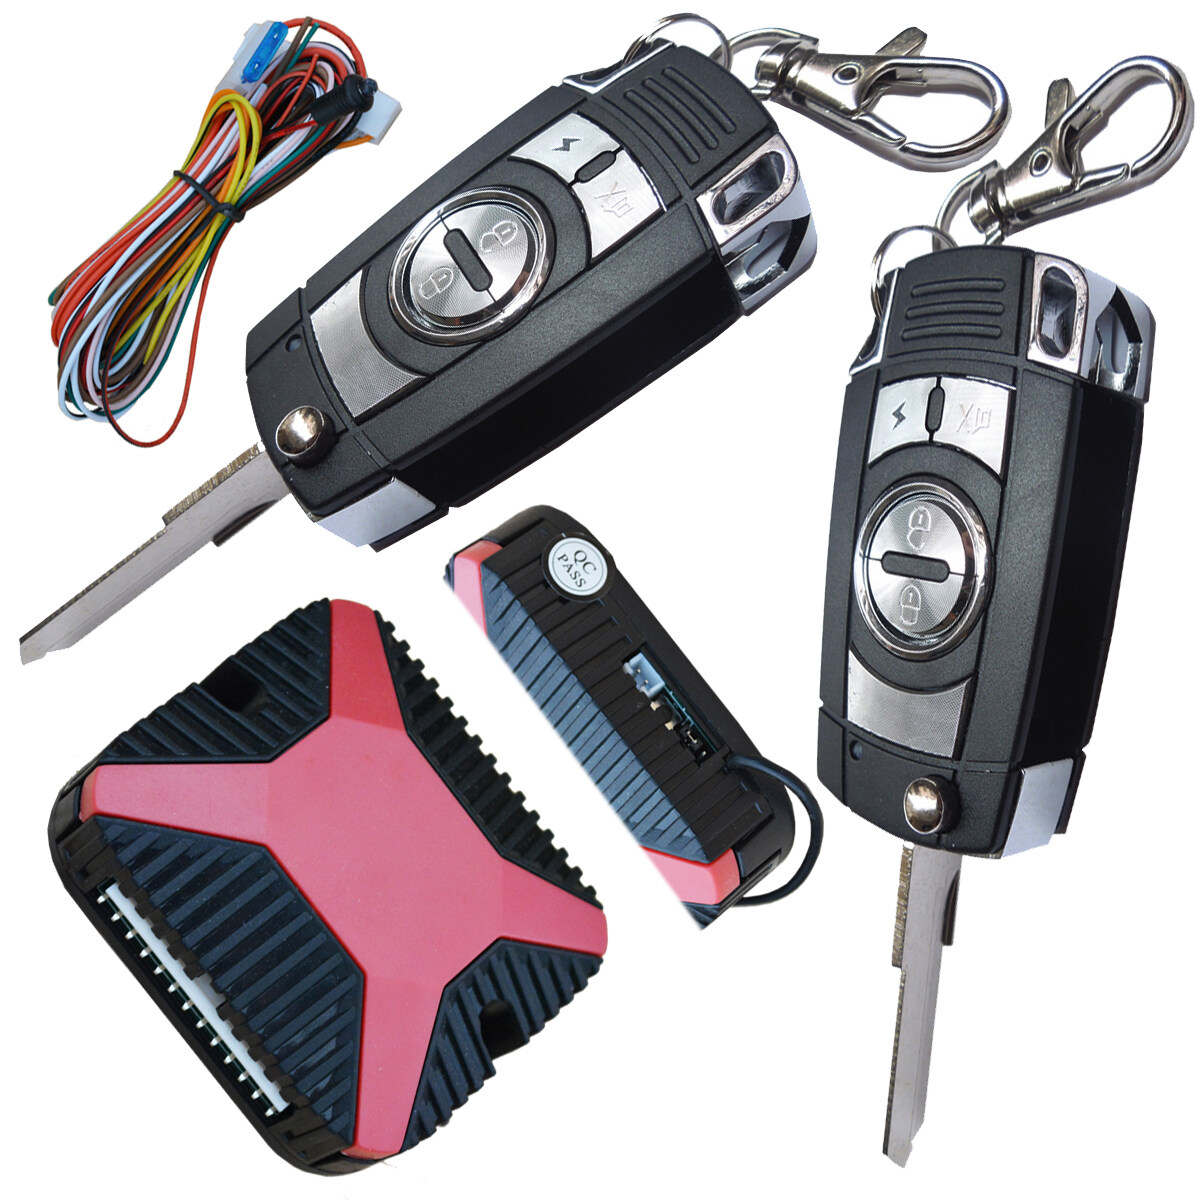 Cardot Top Quality Smart Car Alarmpke Car Alarmalarm Carcar Alarm